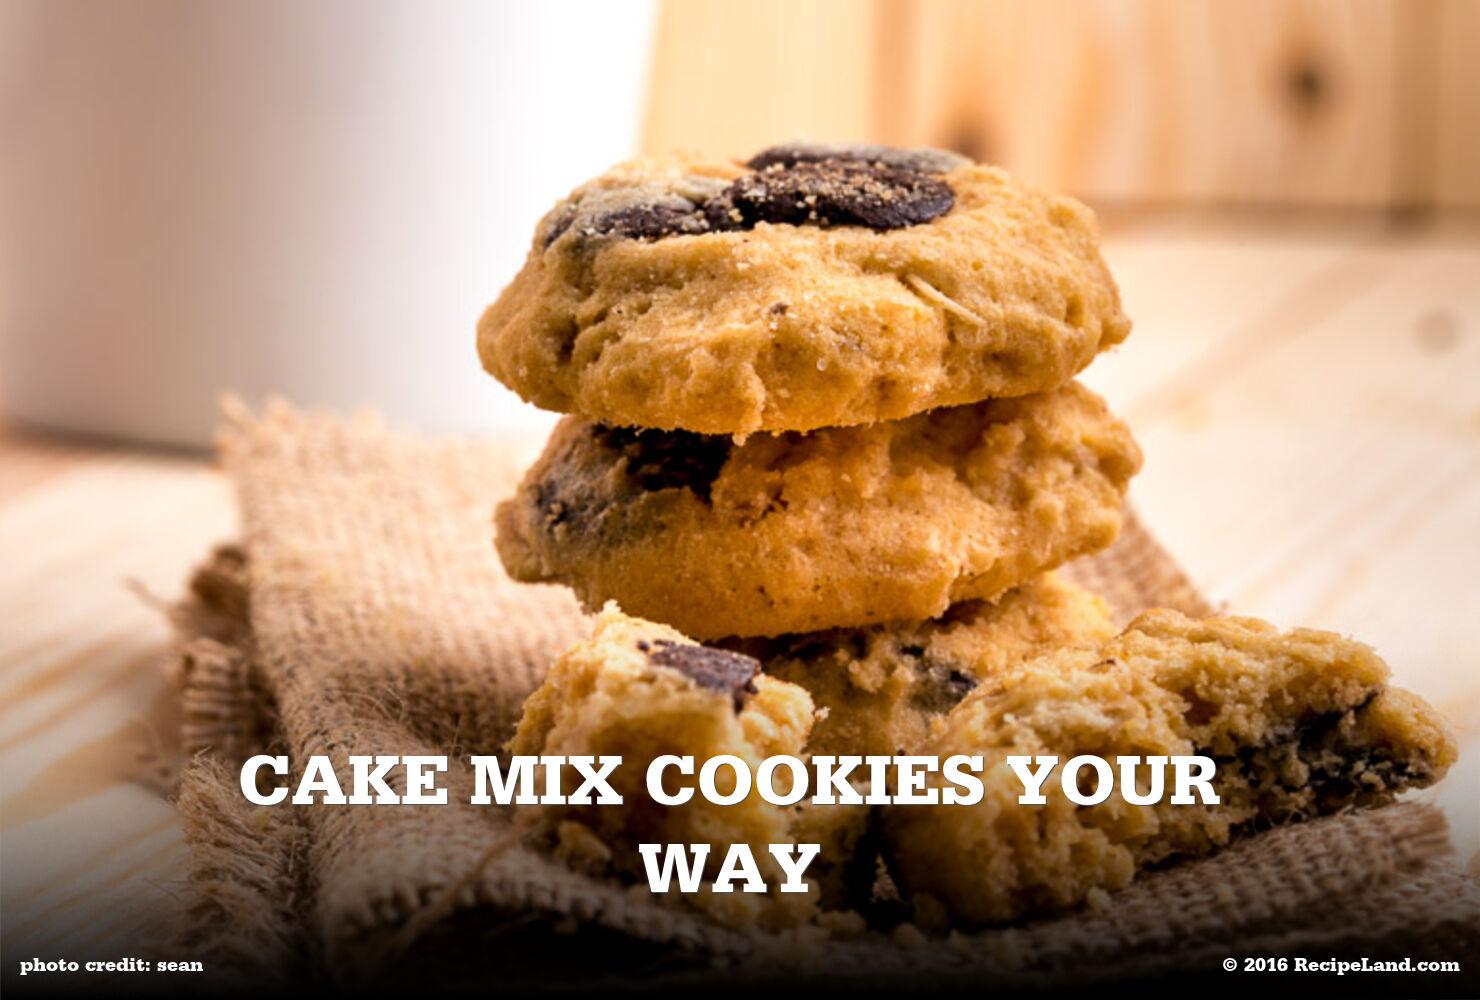 Cake Mix Cookies Your Way